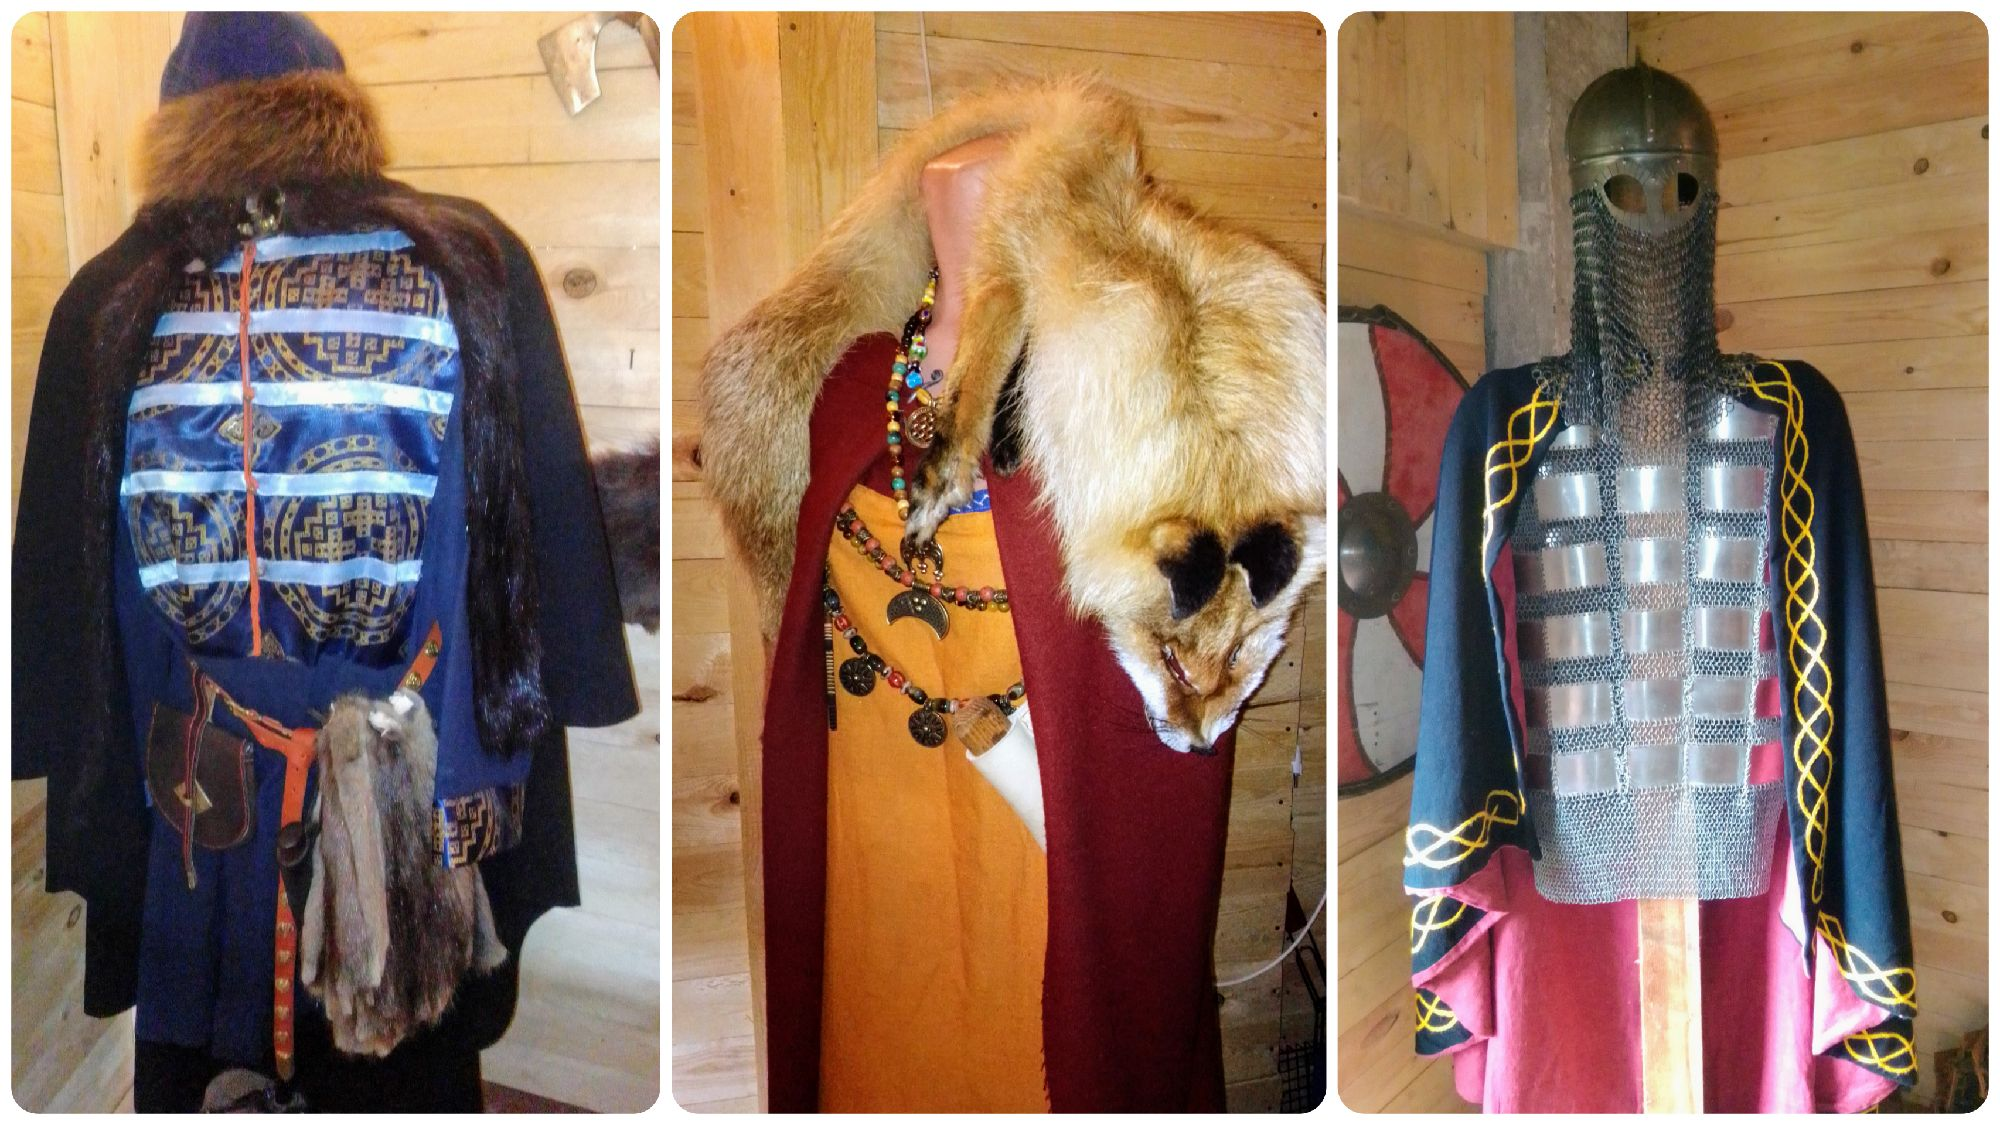 Слева как раз-таки костюм Новгородского князя)